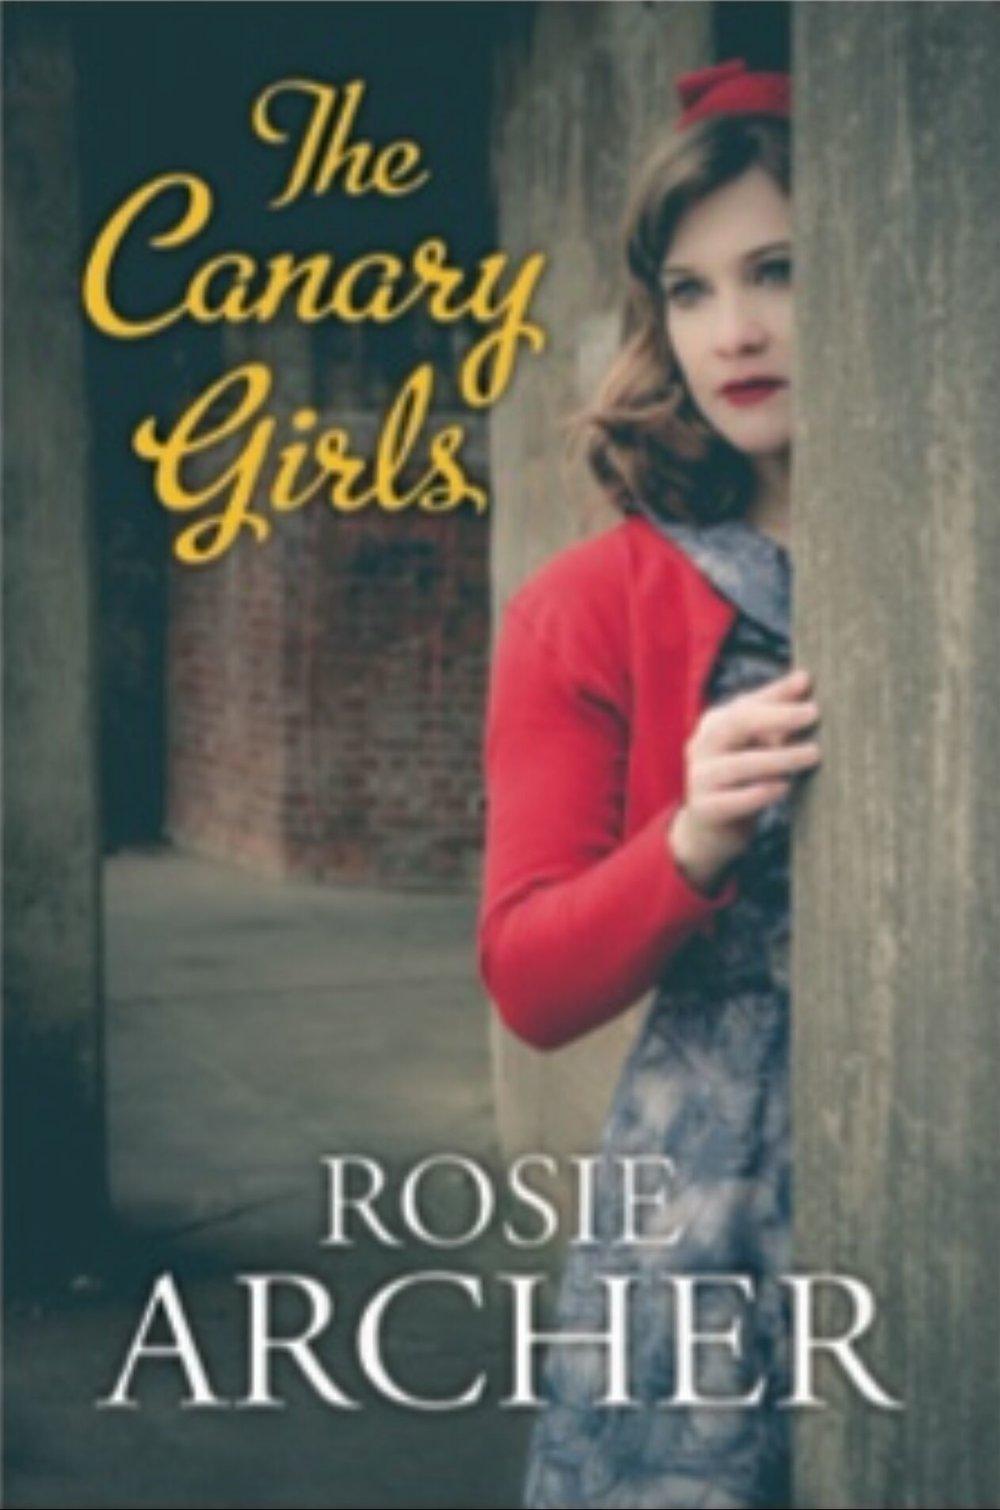 The Canary Girls - Rosie Archer.jpg